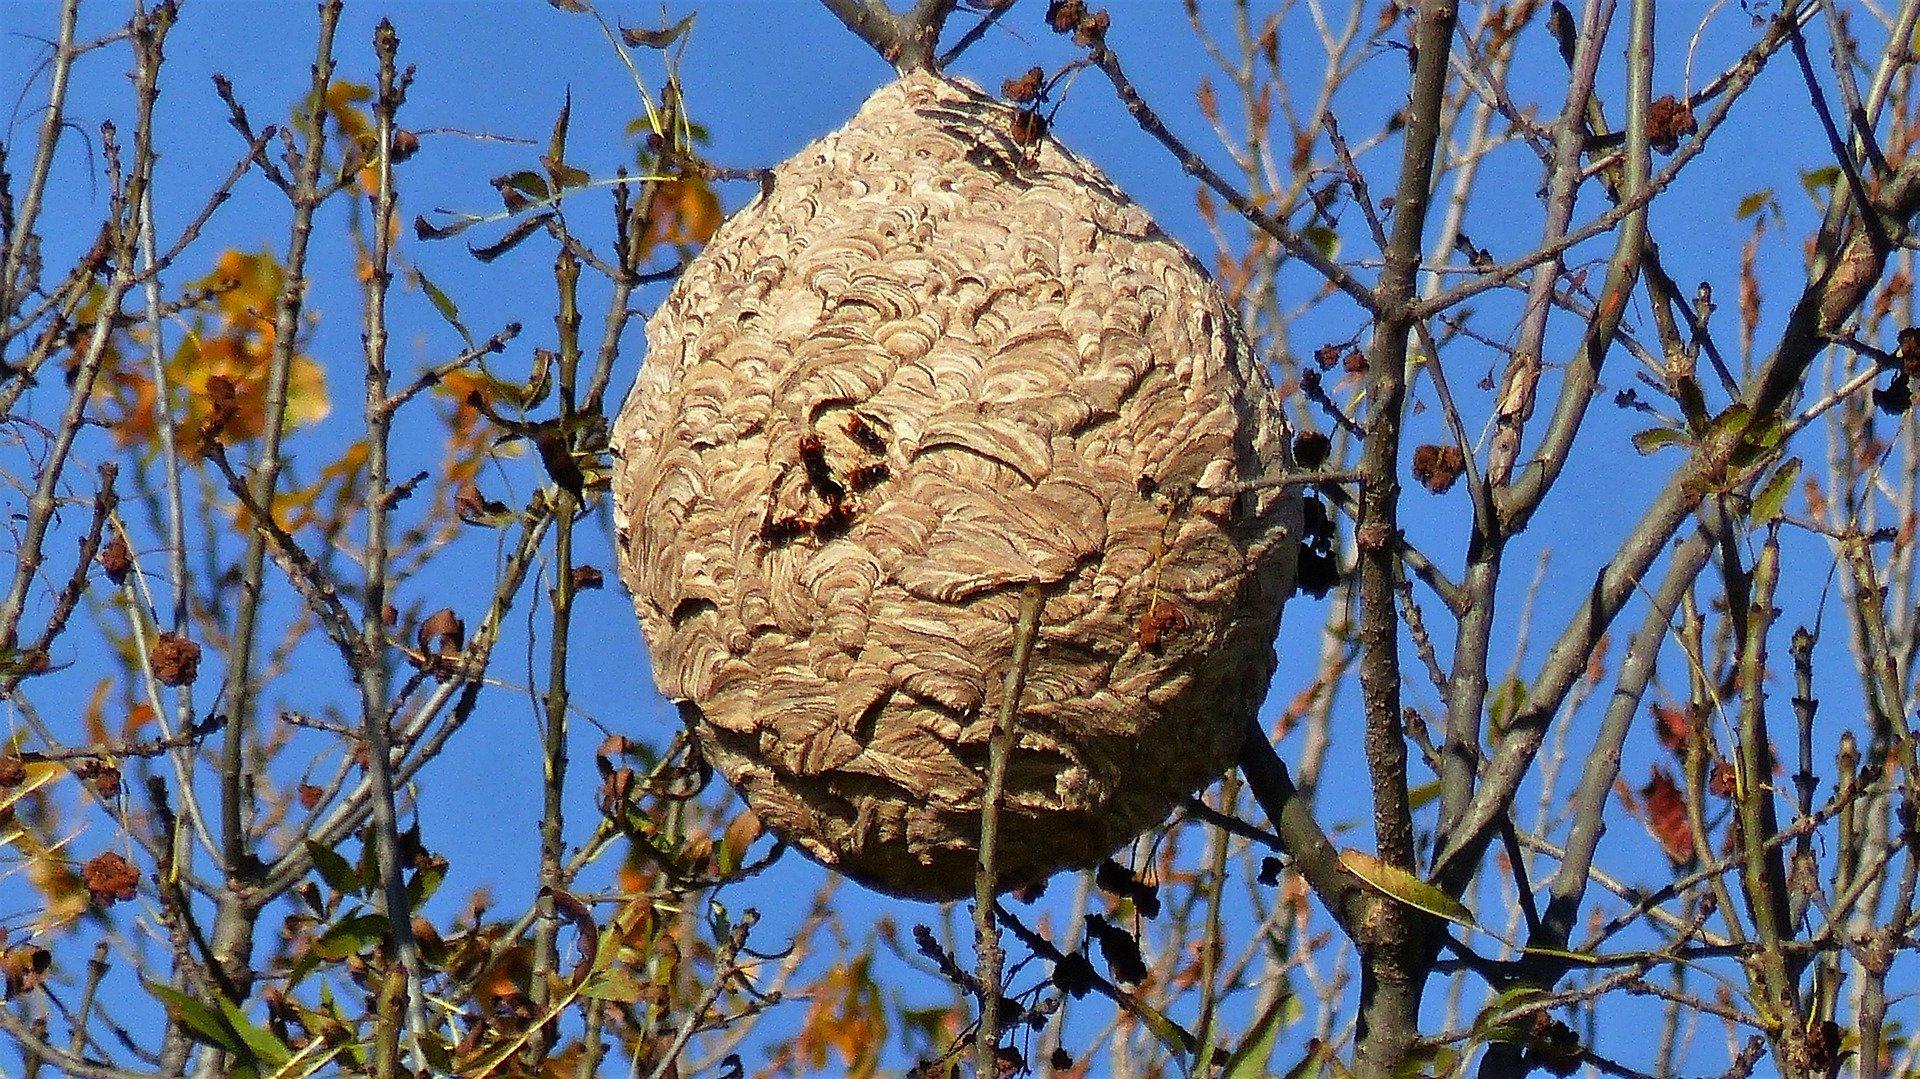 destruction eradication nid de frelon neuilly plaisance